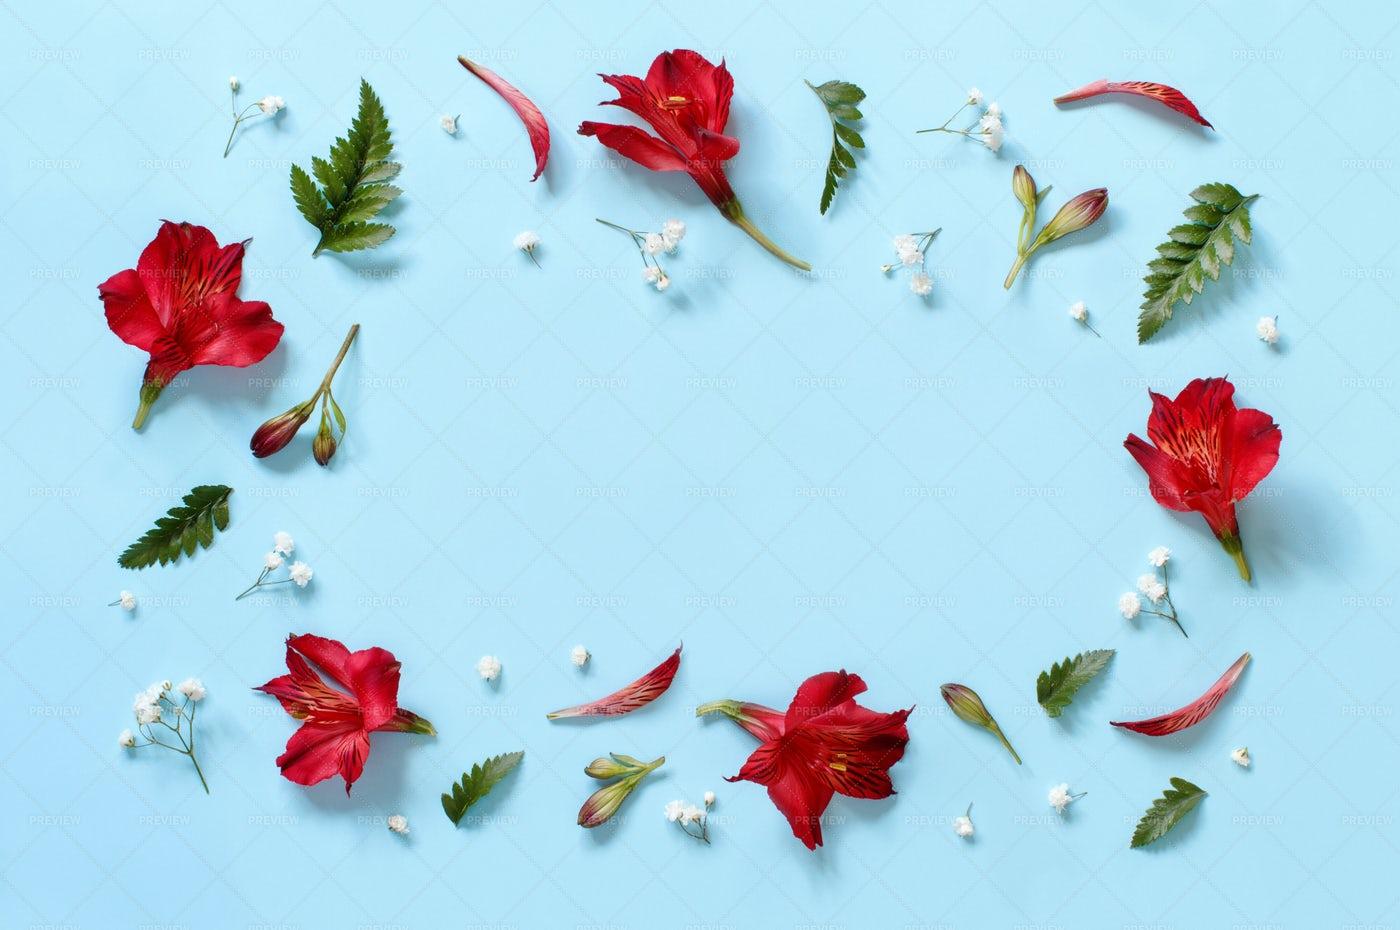 Flowers On Blue: Stock Photos